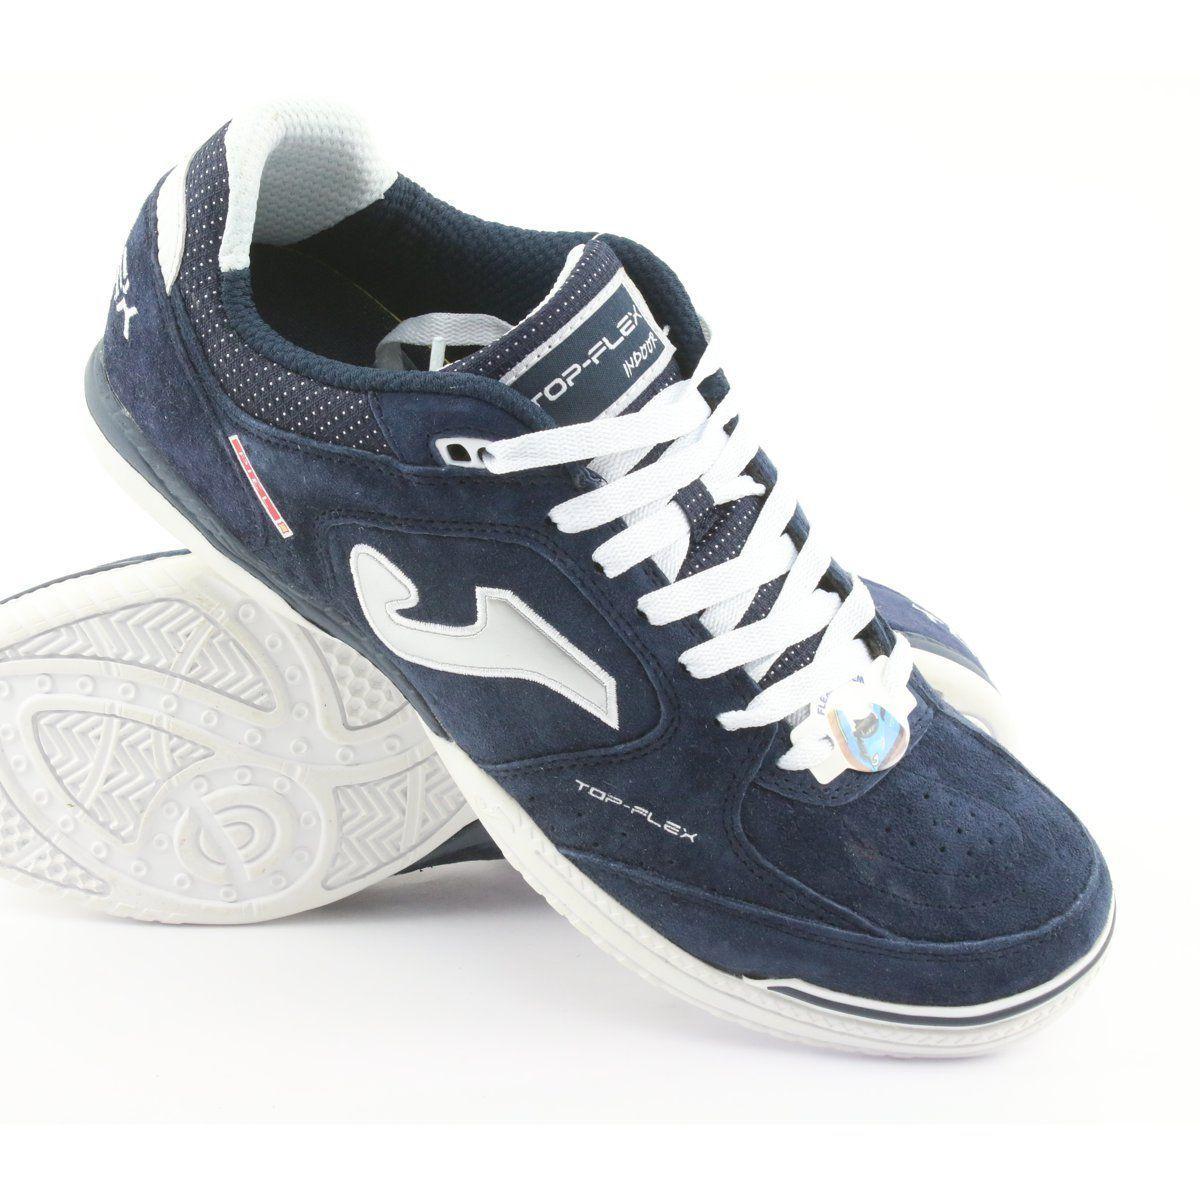 Shoes Joma Top Flex Nobuck 803 Topns 803 In Navy Shoes Indoor Shoe Joma